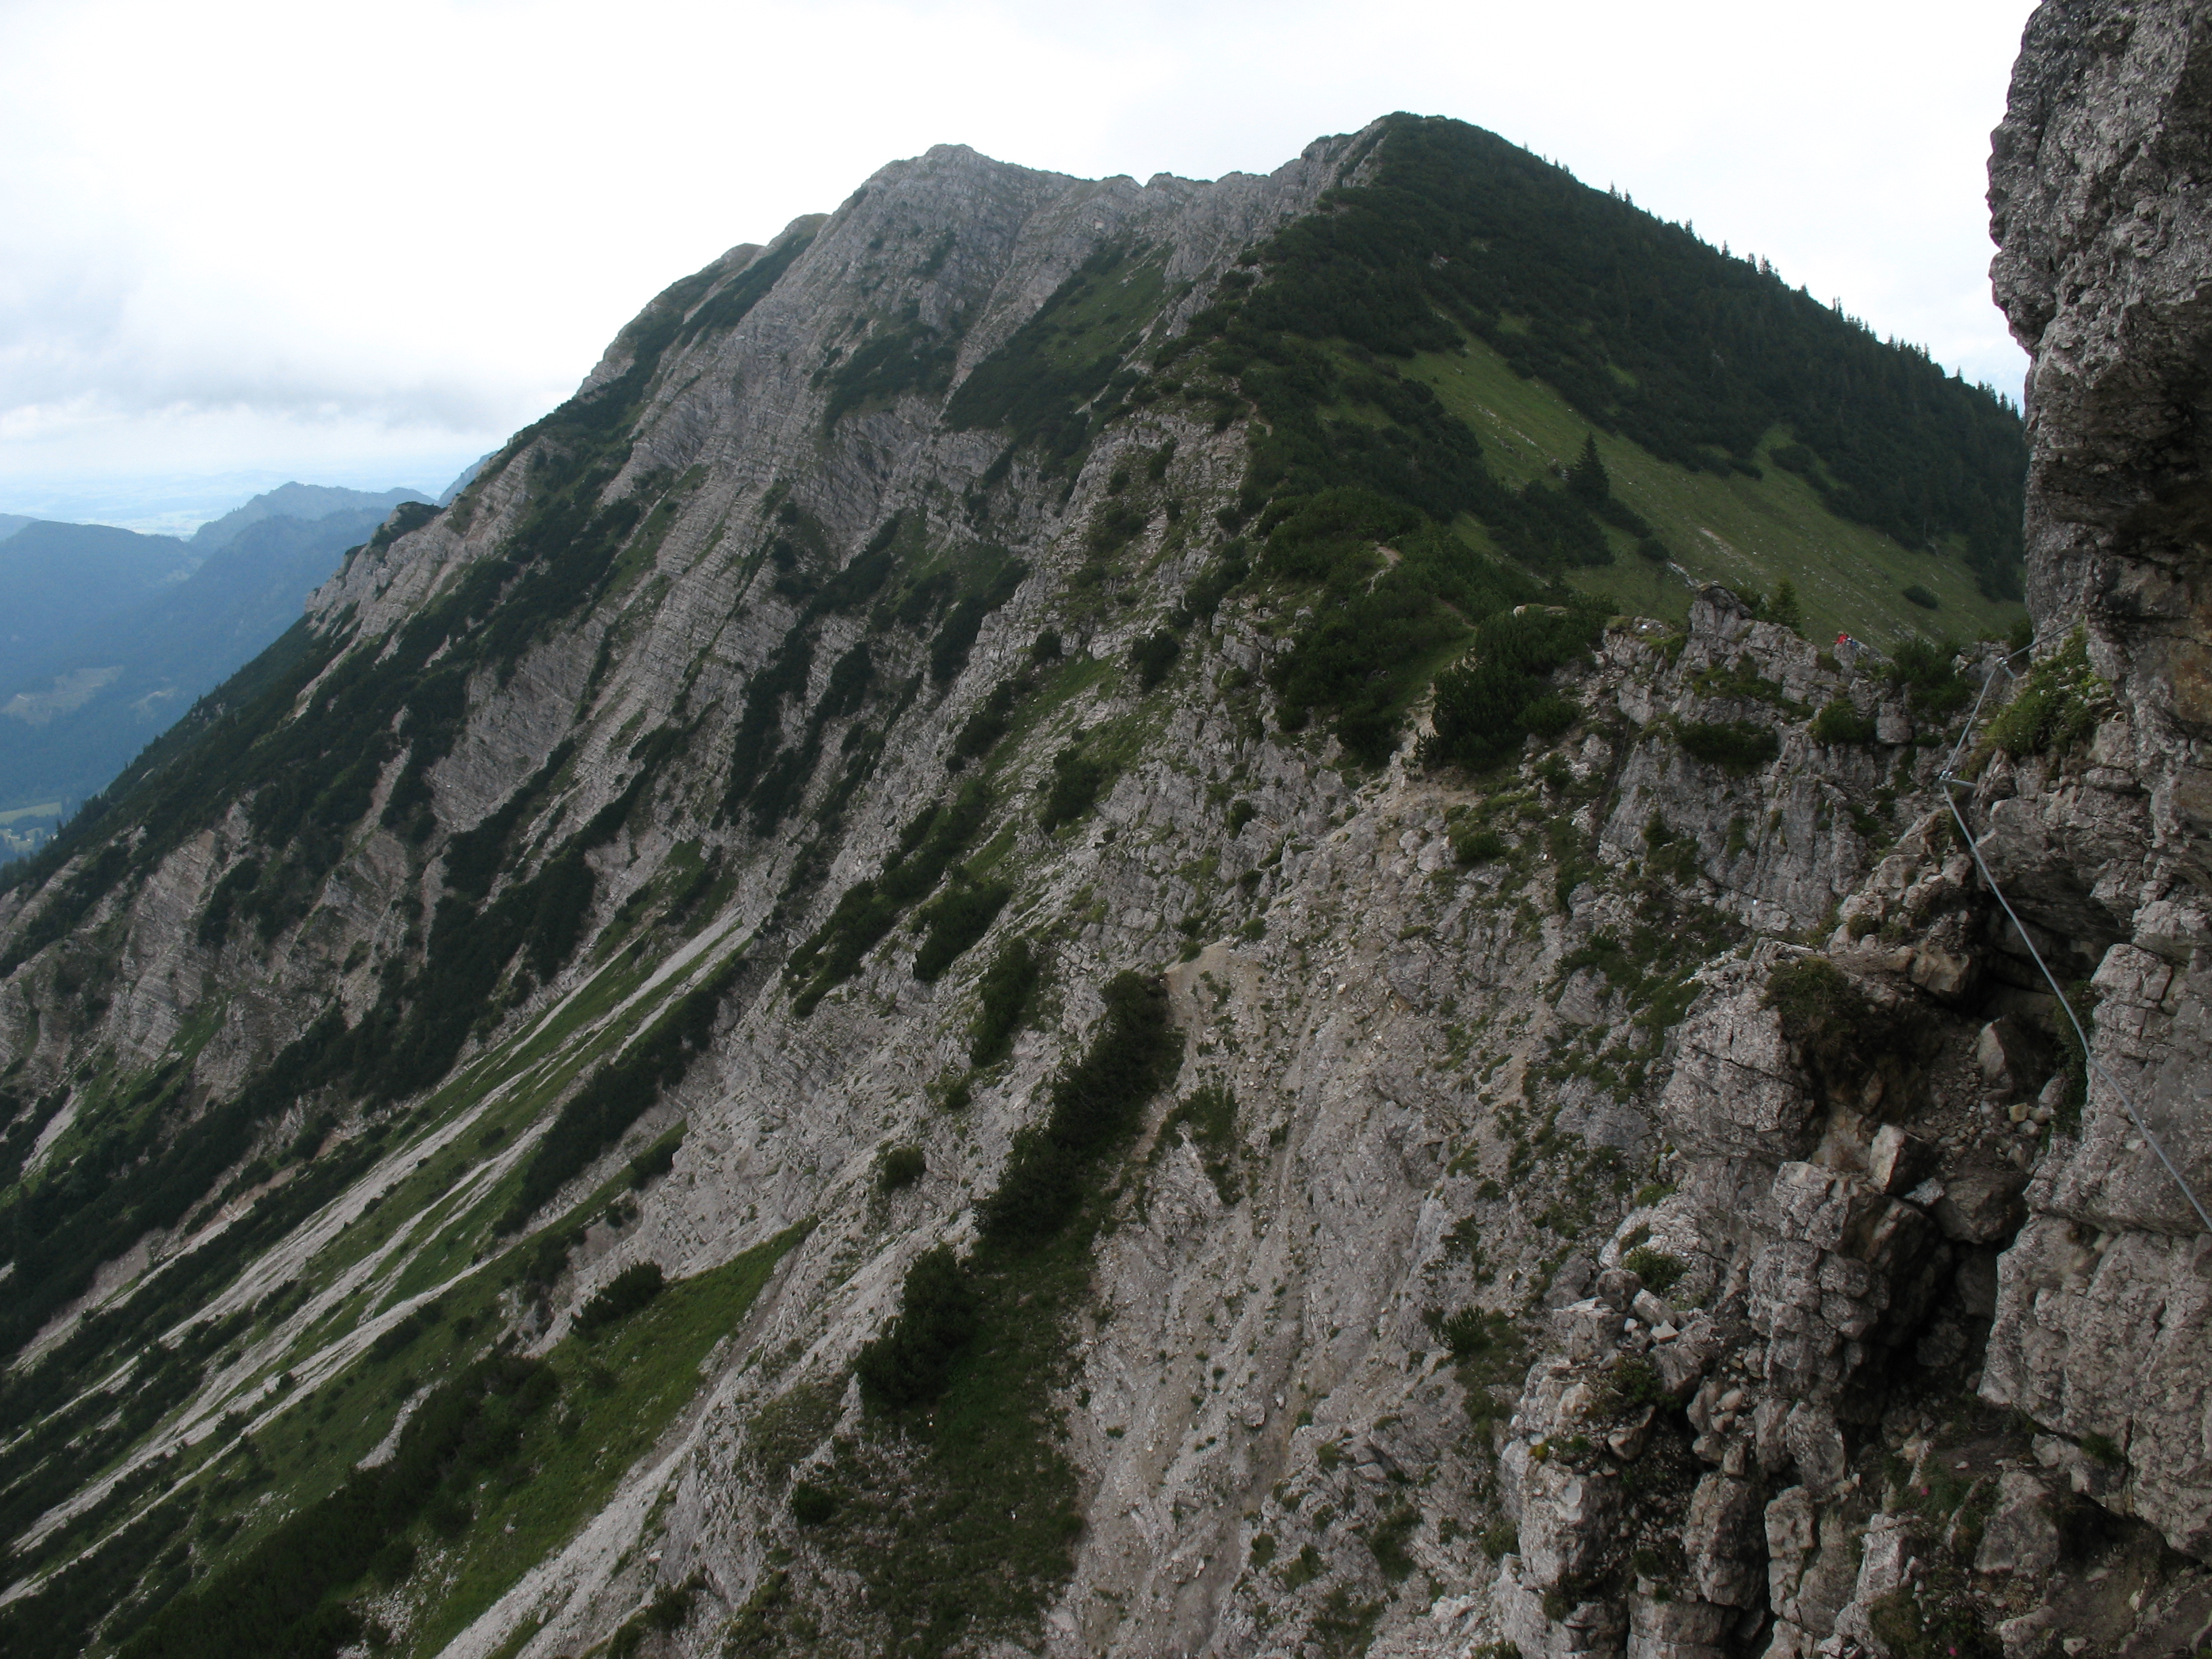 Klettersteig Iseler : Datei iseler klettersteig kühgundkopf g u wikipedia